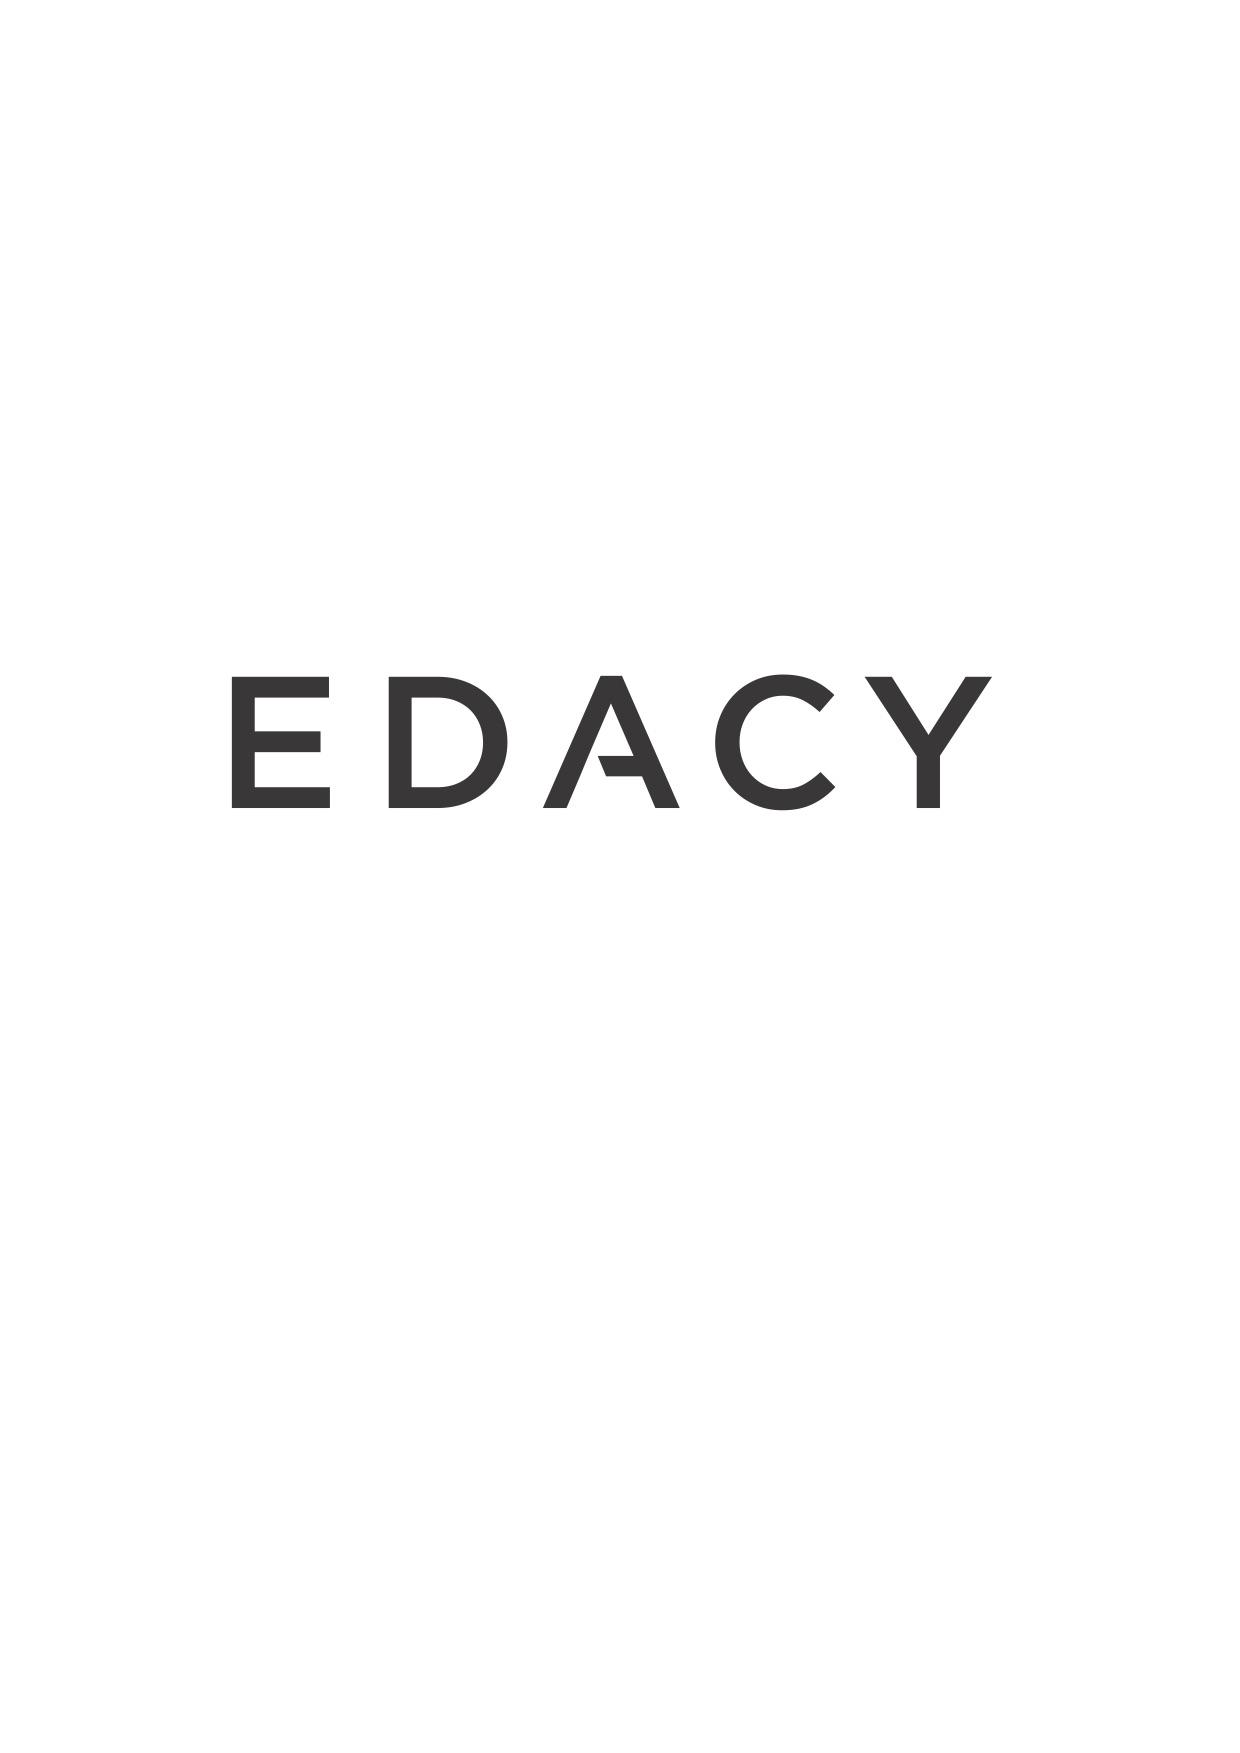 edacy logo.jpg